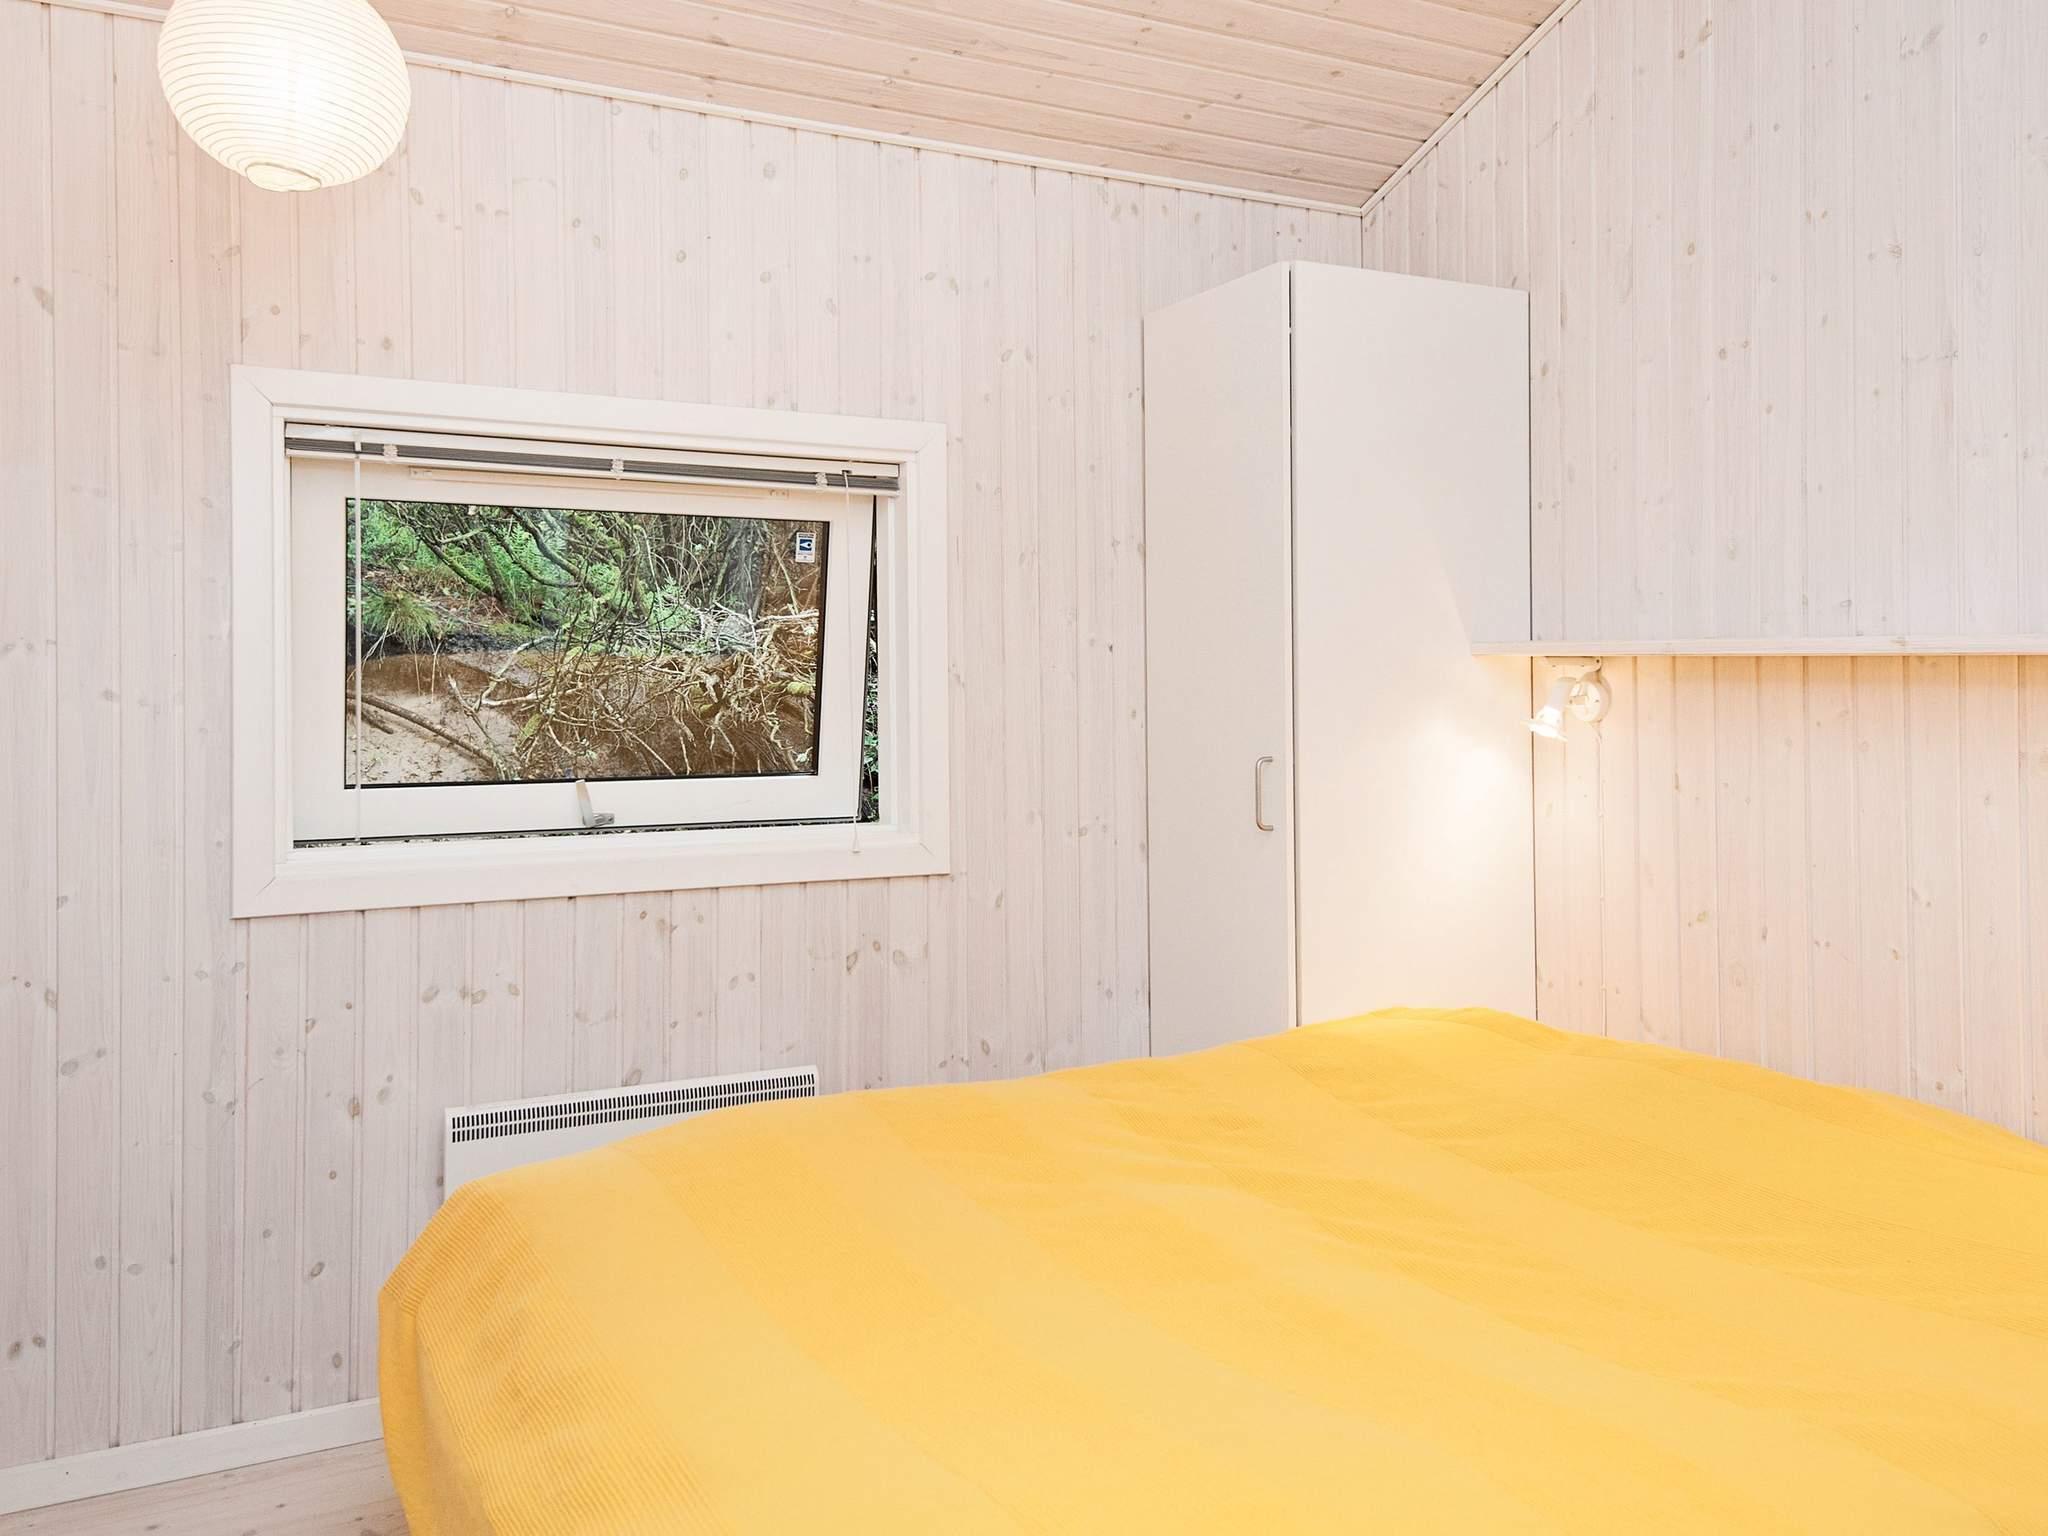 Ferienhaus Fjellerup Strand (125856), Fjellerup, , Ostjütland, Dänemark, Bild 13